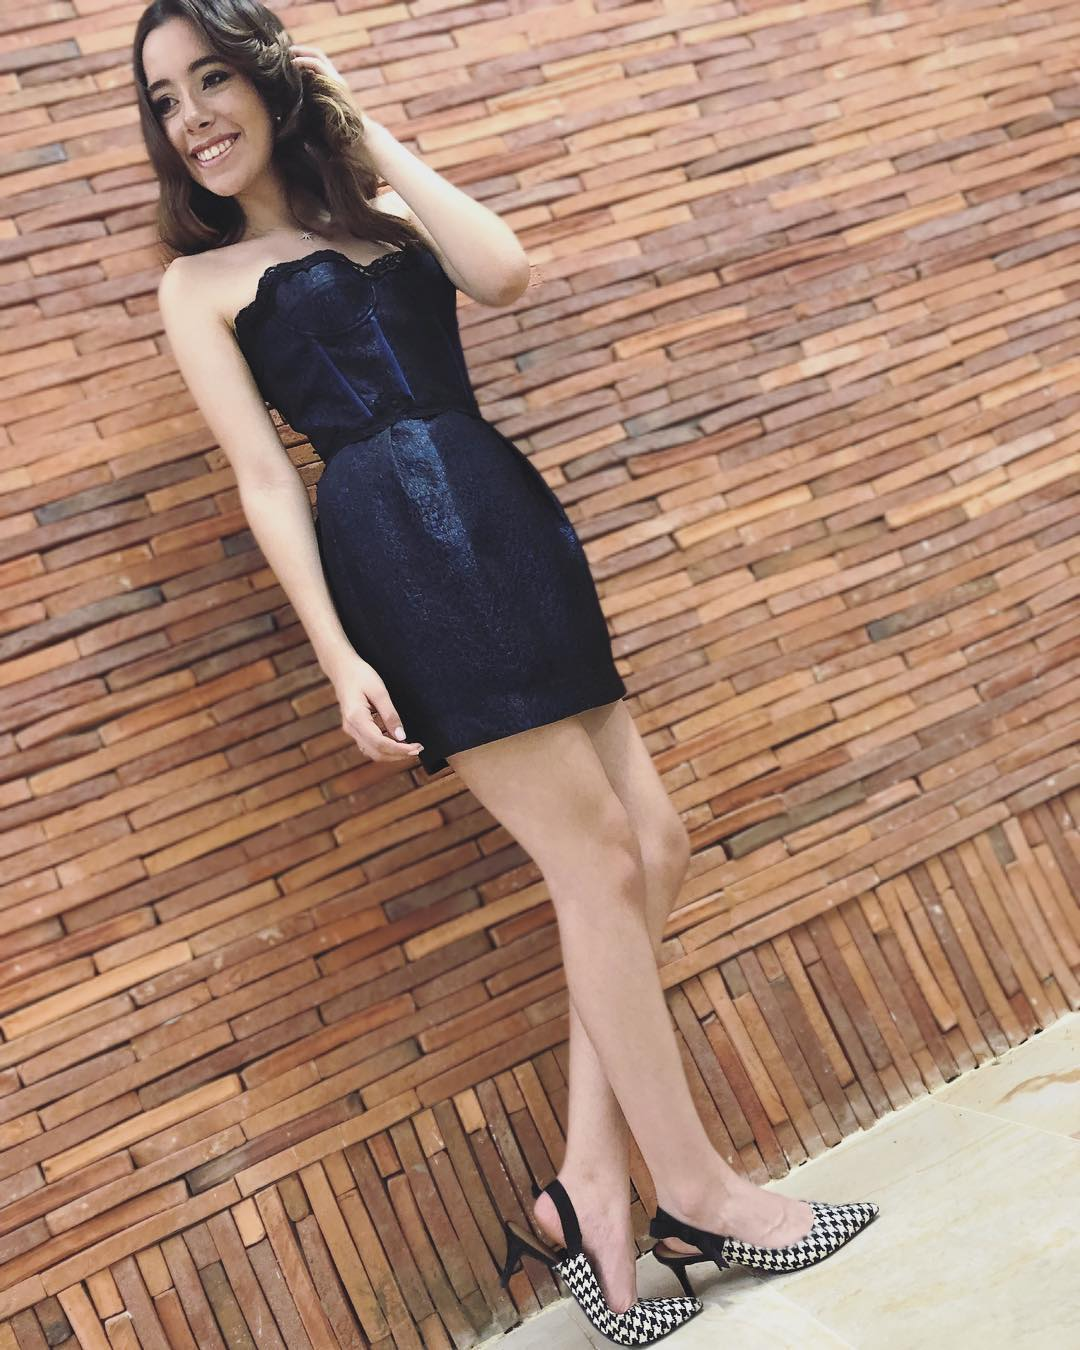 maya mejia ospina, miss teen mundial colombia 2019. 51509210